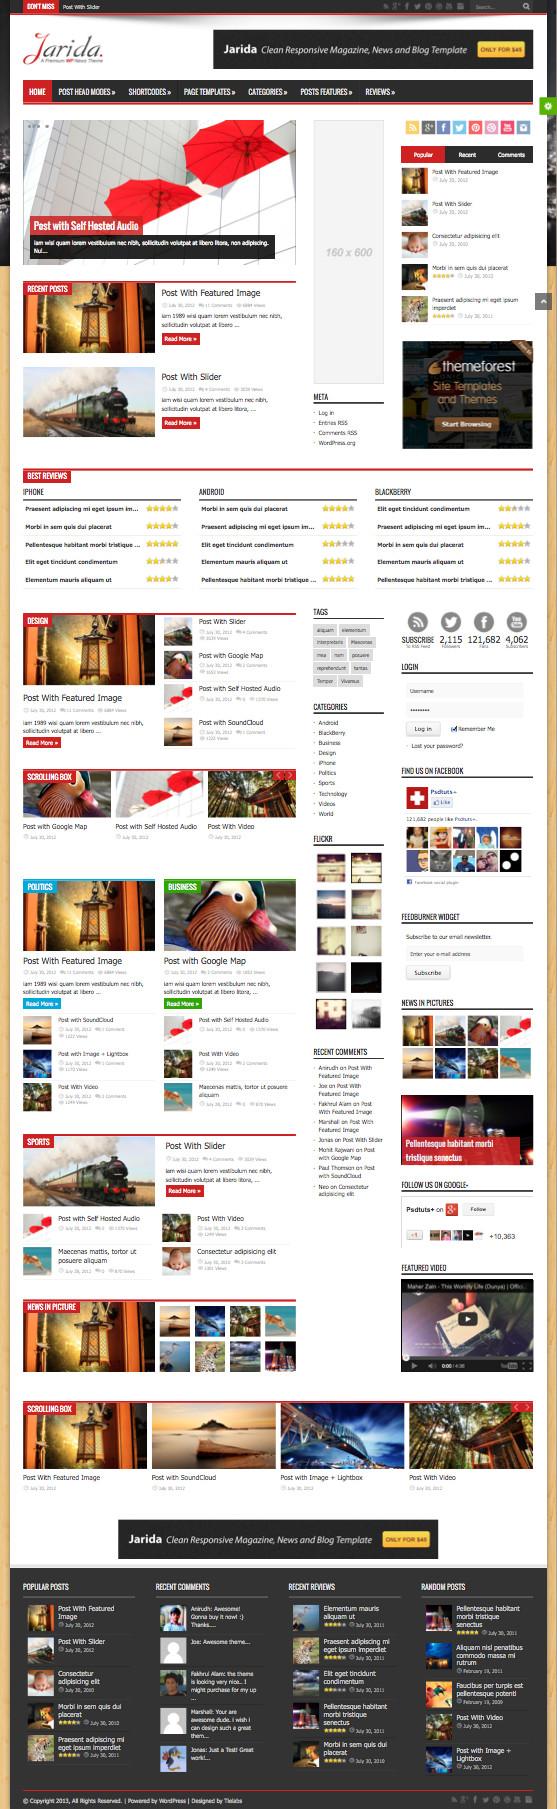 Jarida Responsive WordPress Magazine Theme